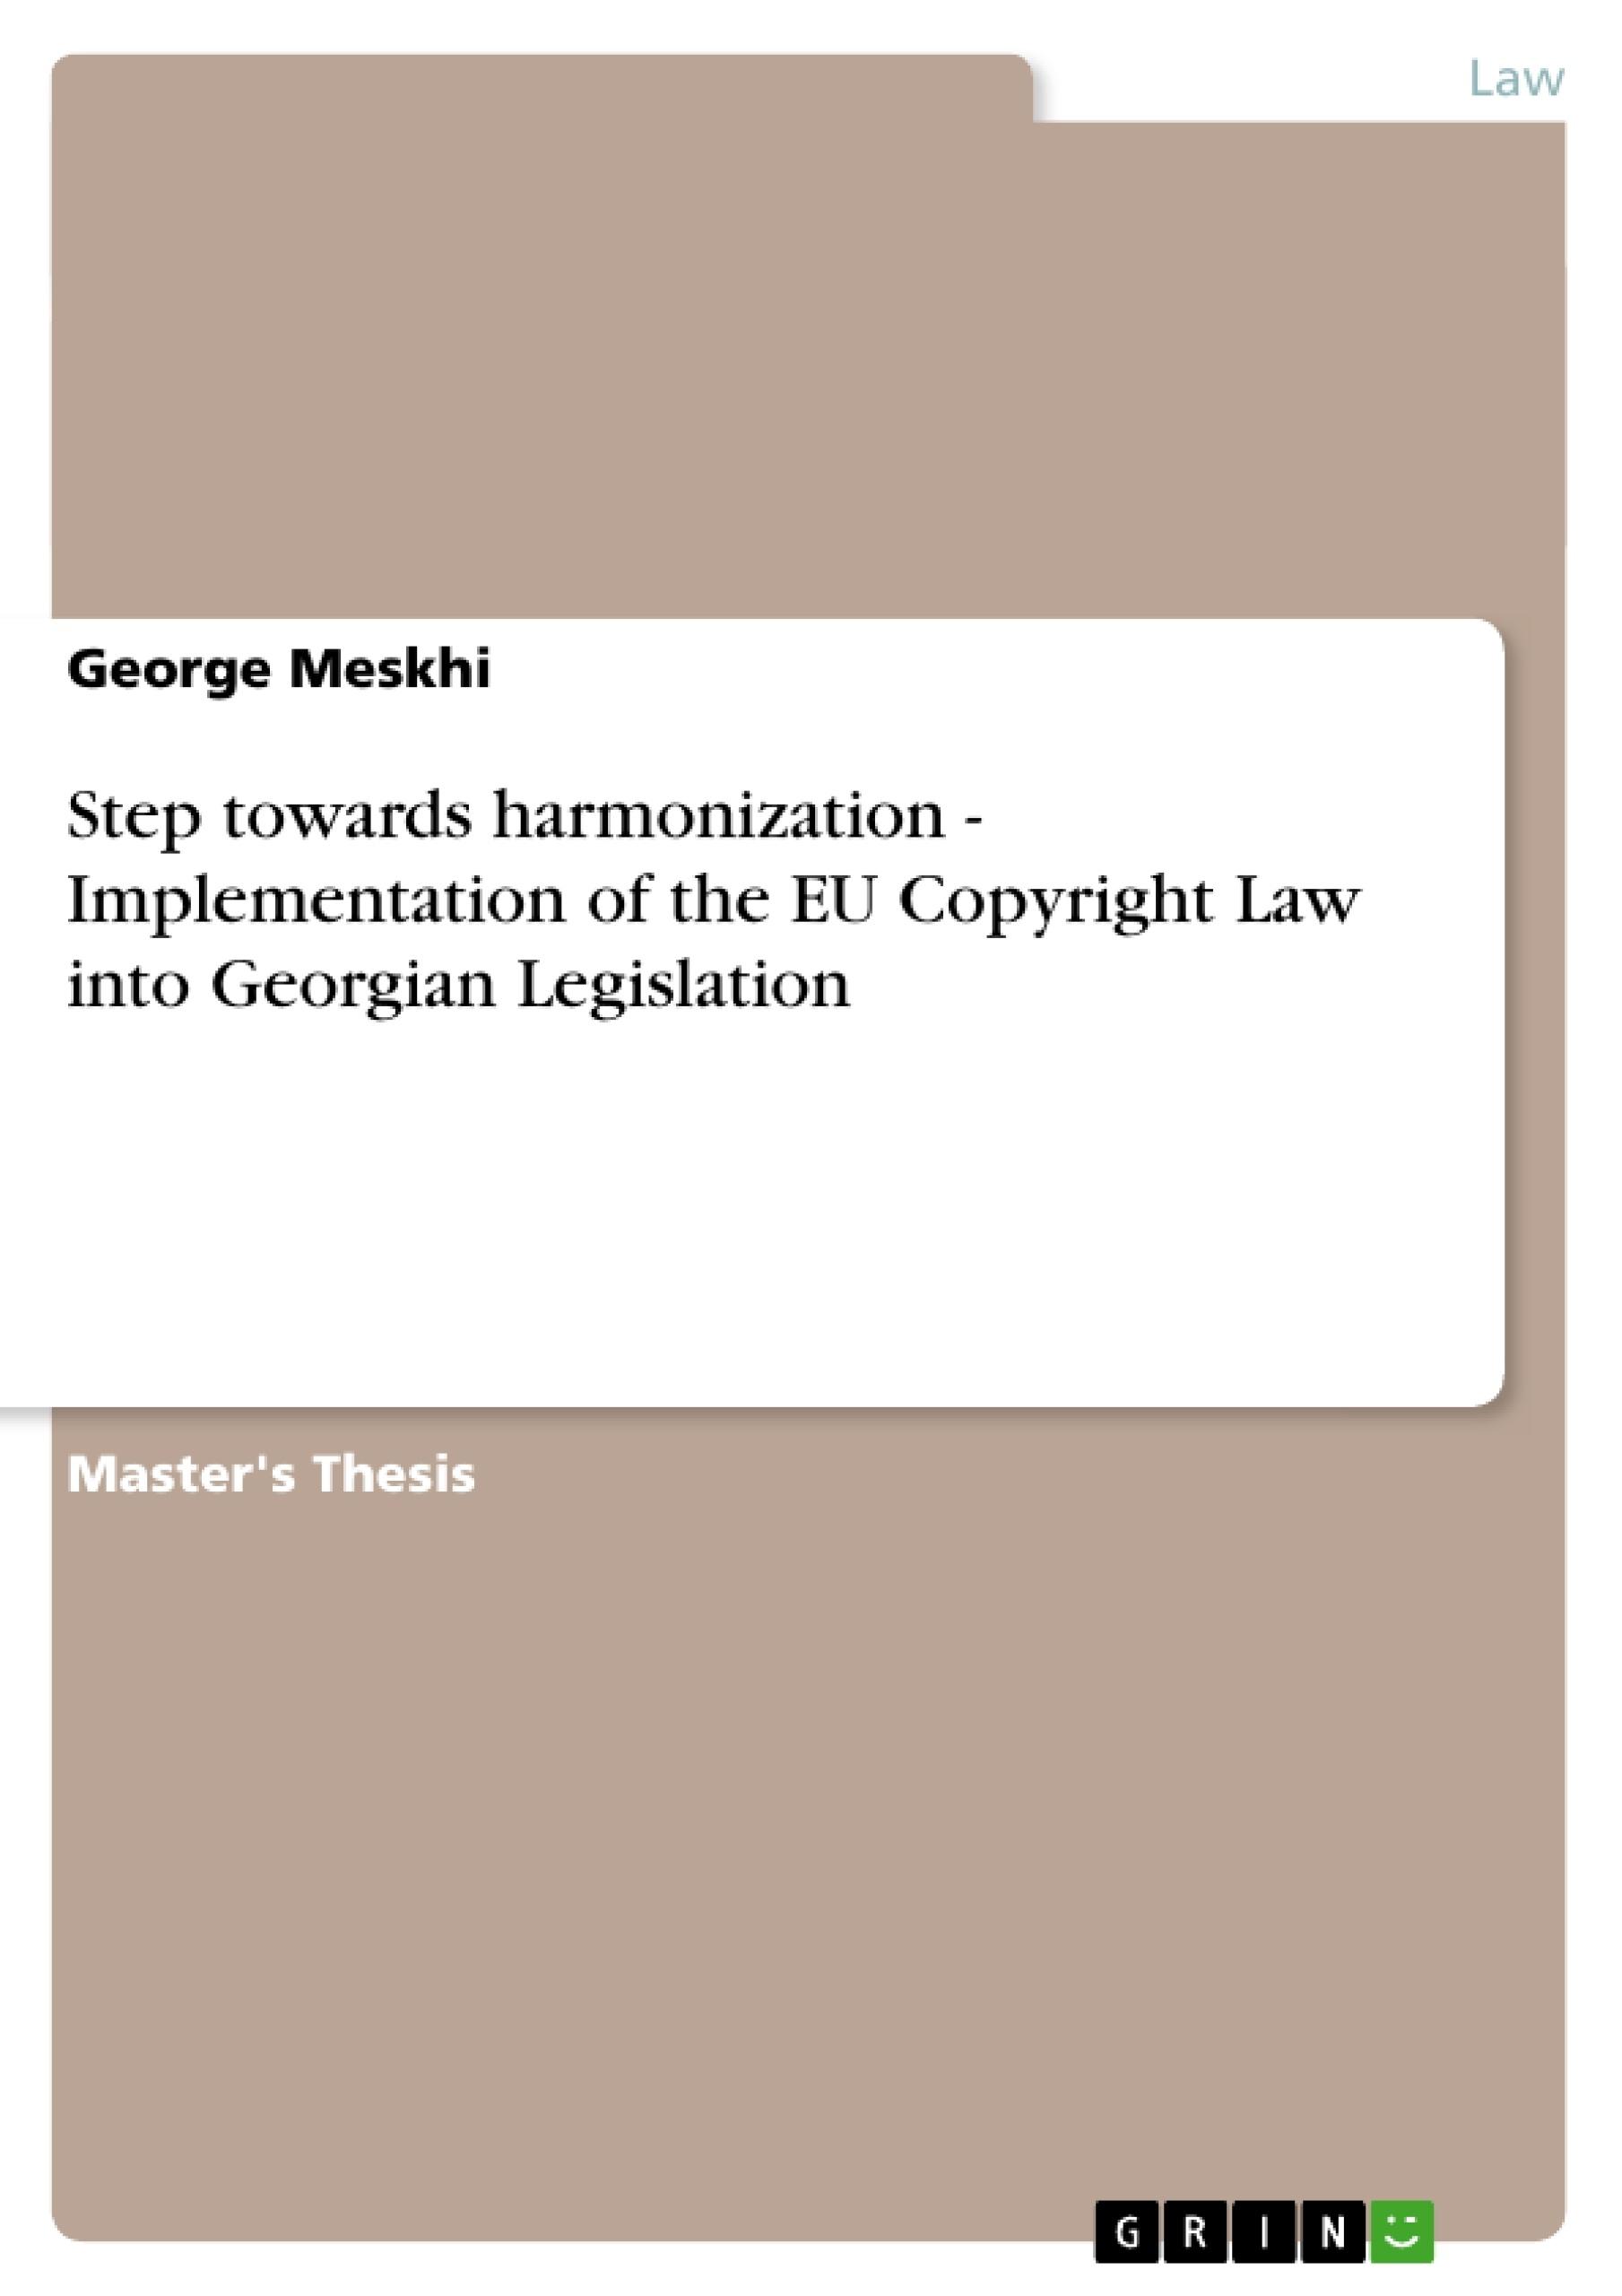 Title: Step towards harmonization - Implementation of the EU Copyright Law into Georgian Legislation